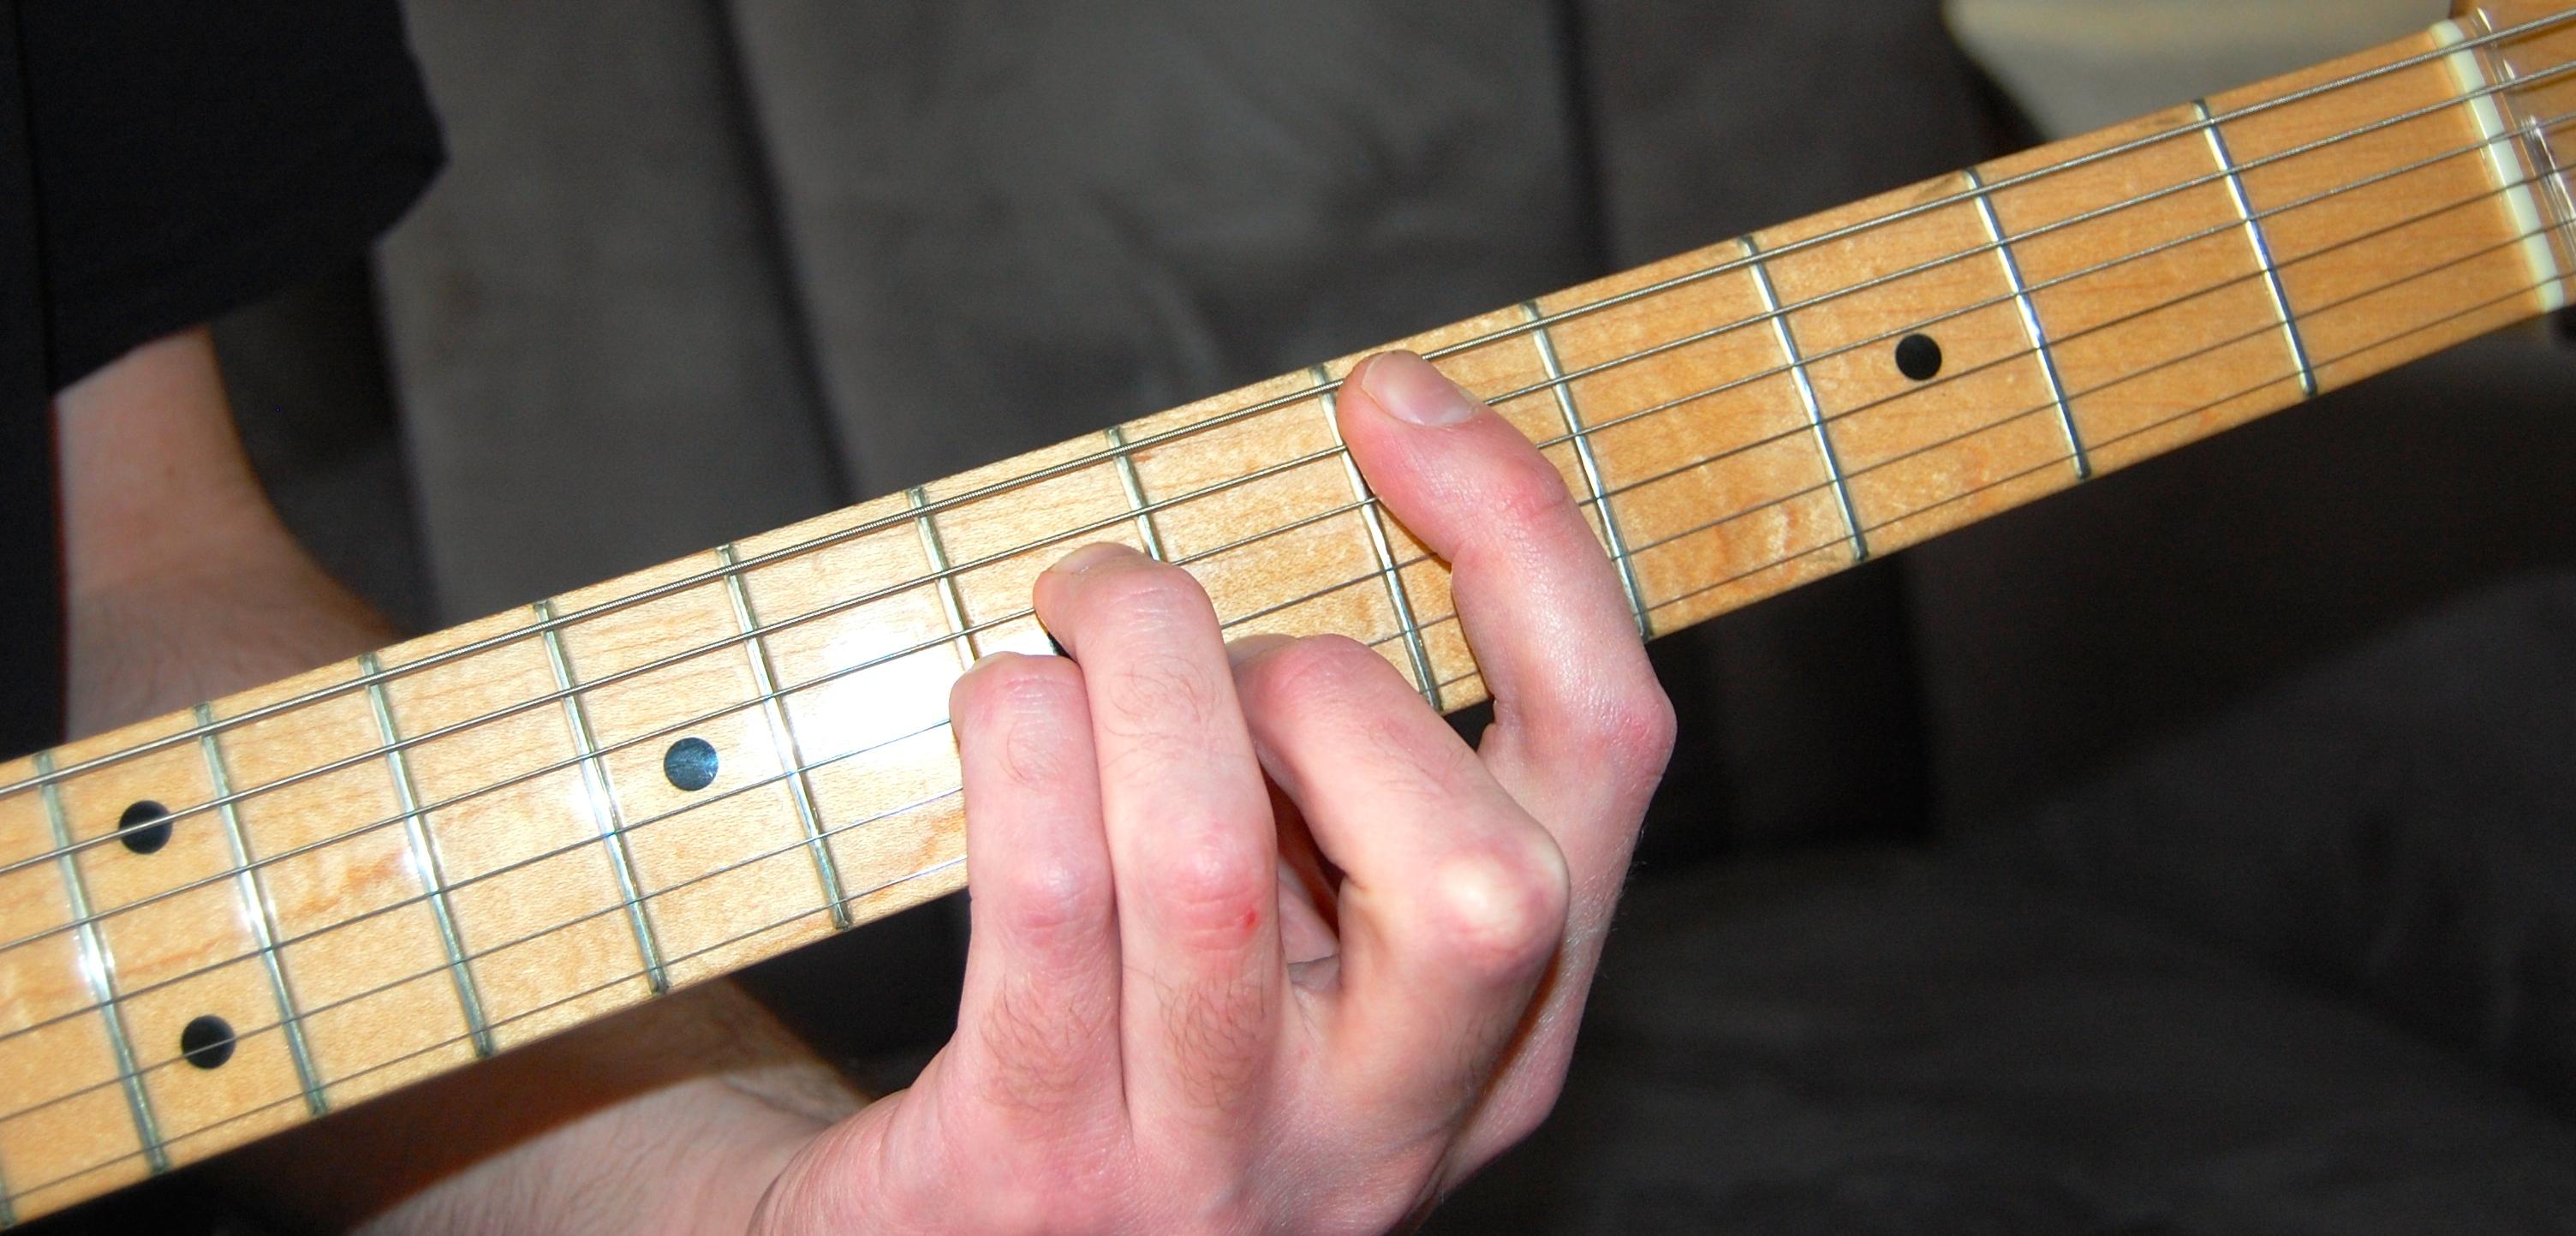 Apprendre les accords la guitare audiofanzine - Apprendre la guitare seul mi guitar ...